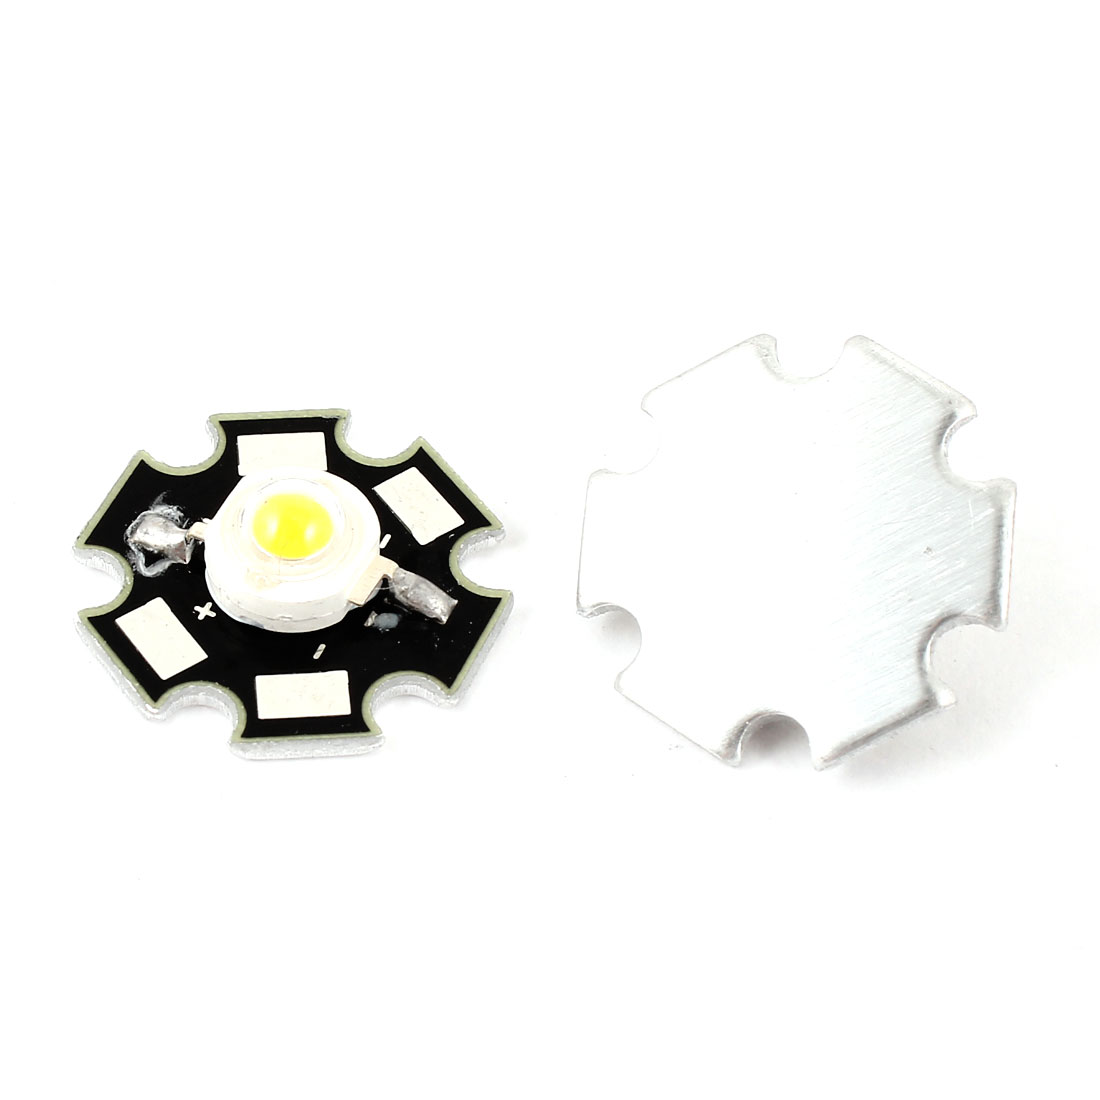 2pcs 3.0-3.9V 160-180LM 3W Warm White Light LED Emitter Lamp Bead w Heat Sink Base